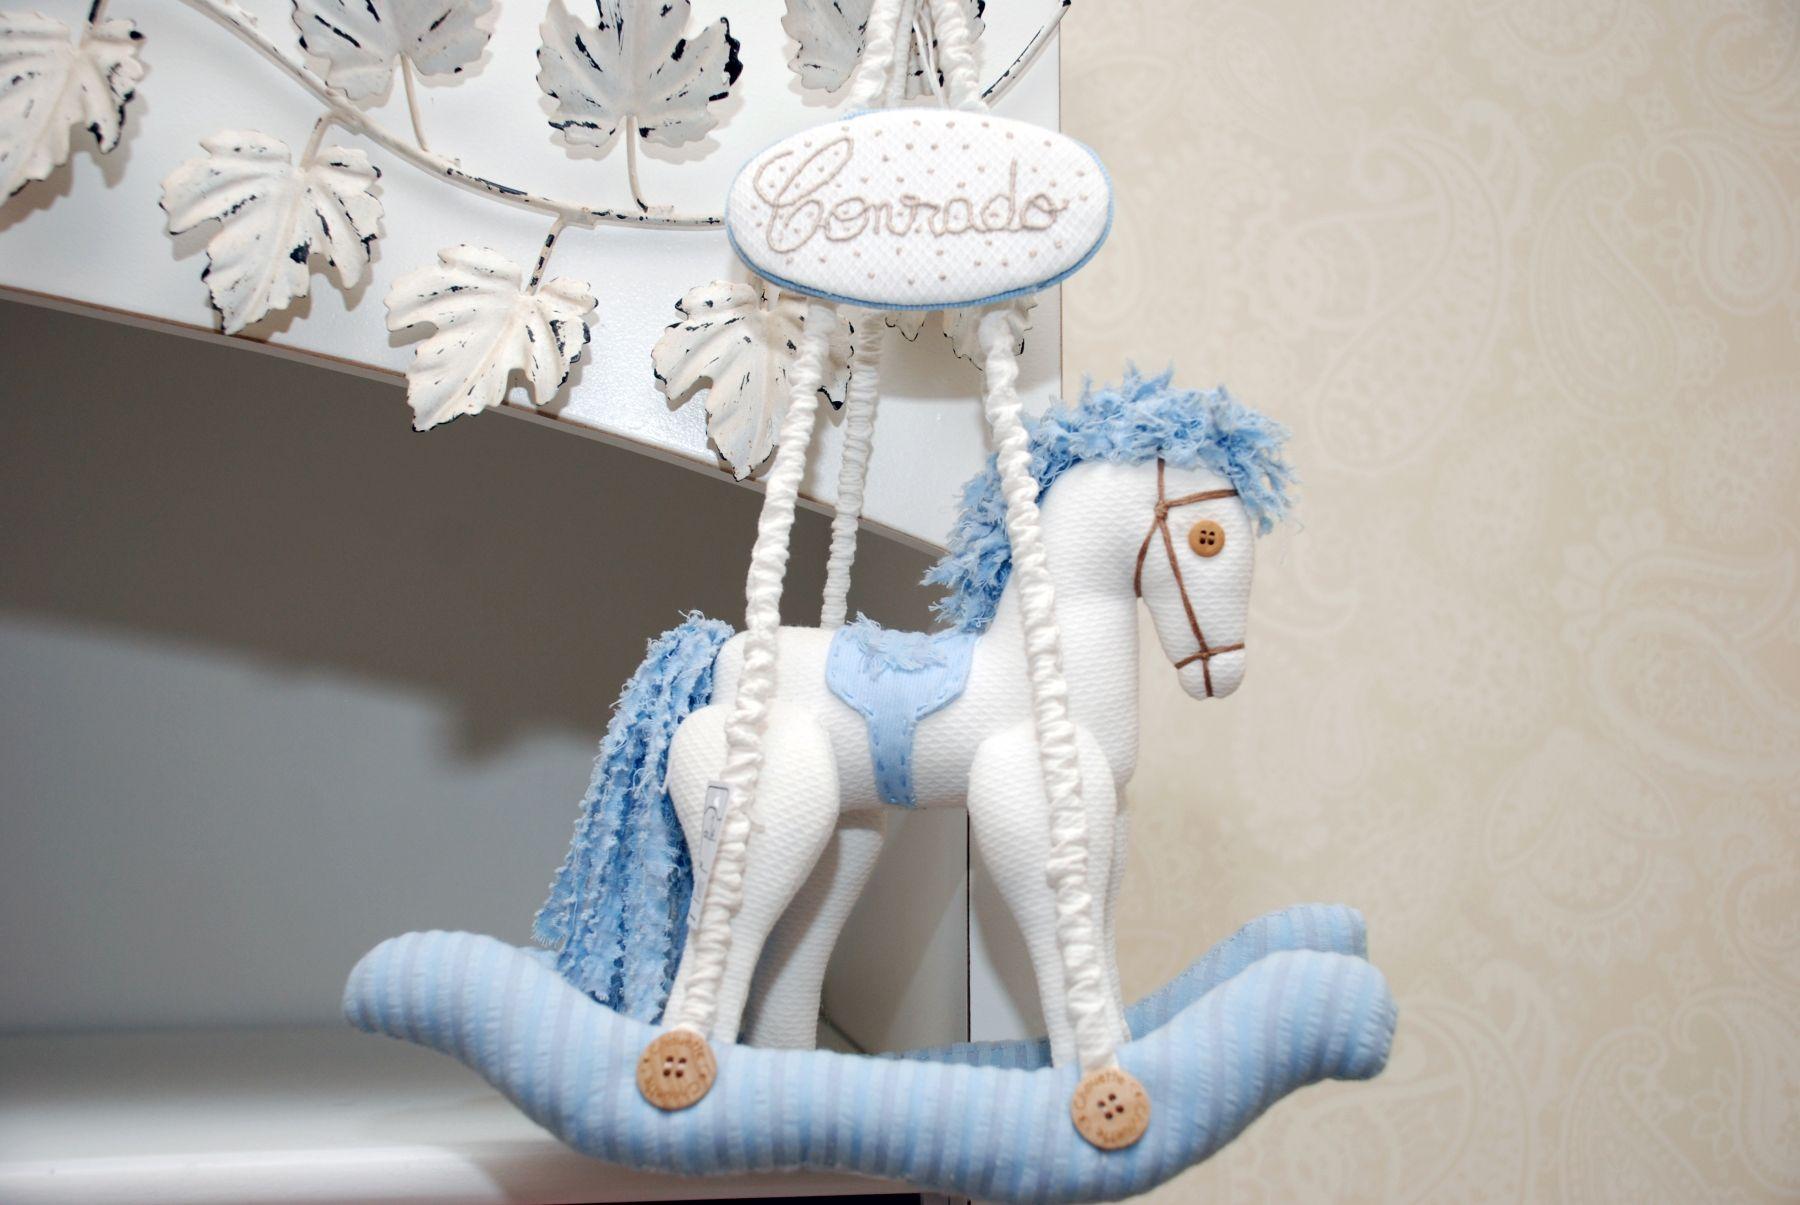 quadro porta maternidade cavalo - Pesquisa Google